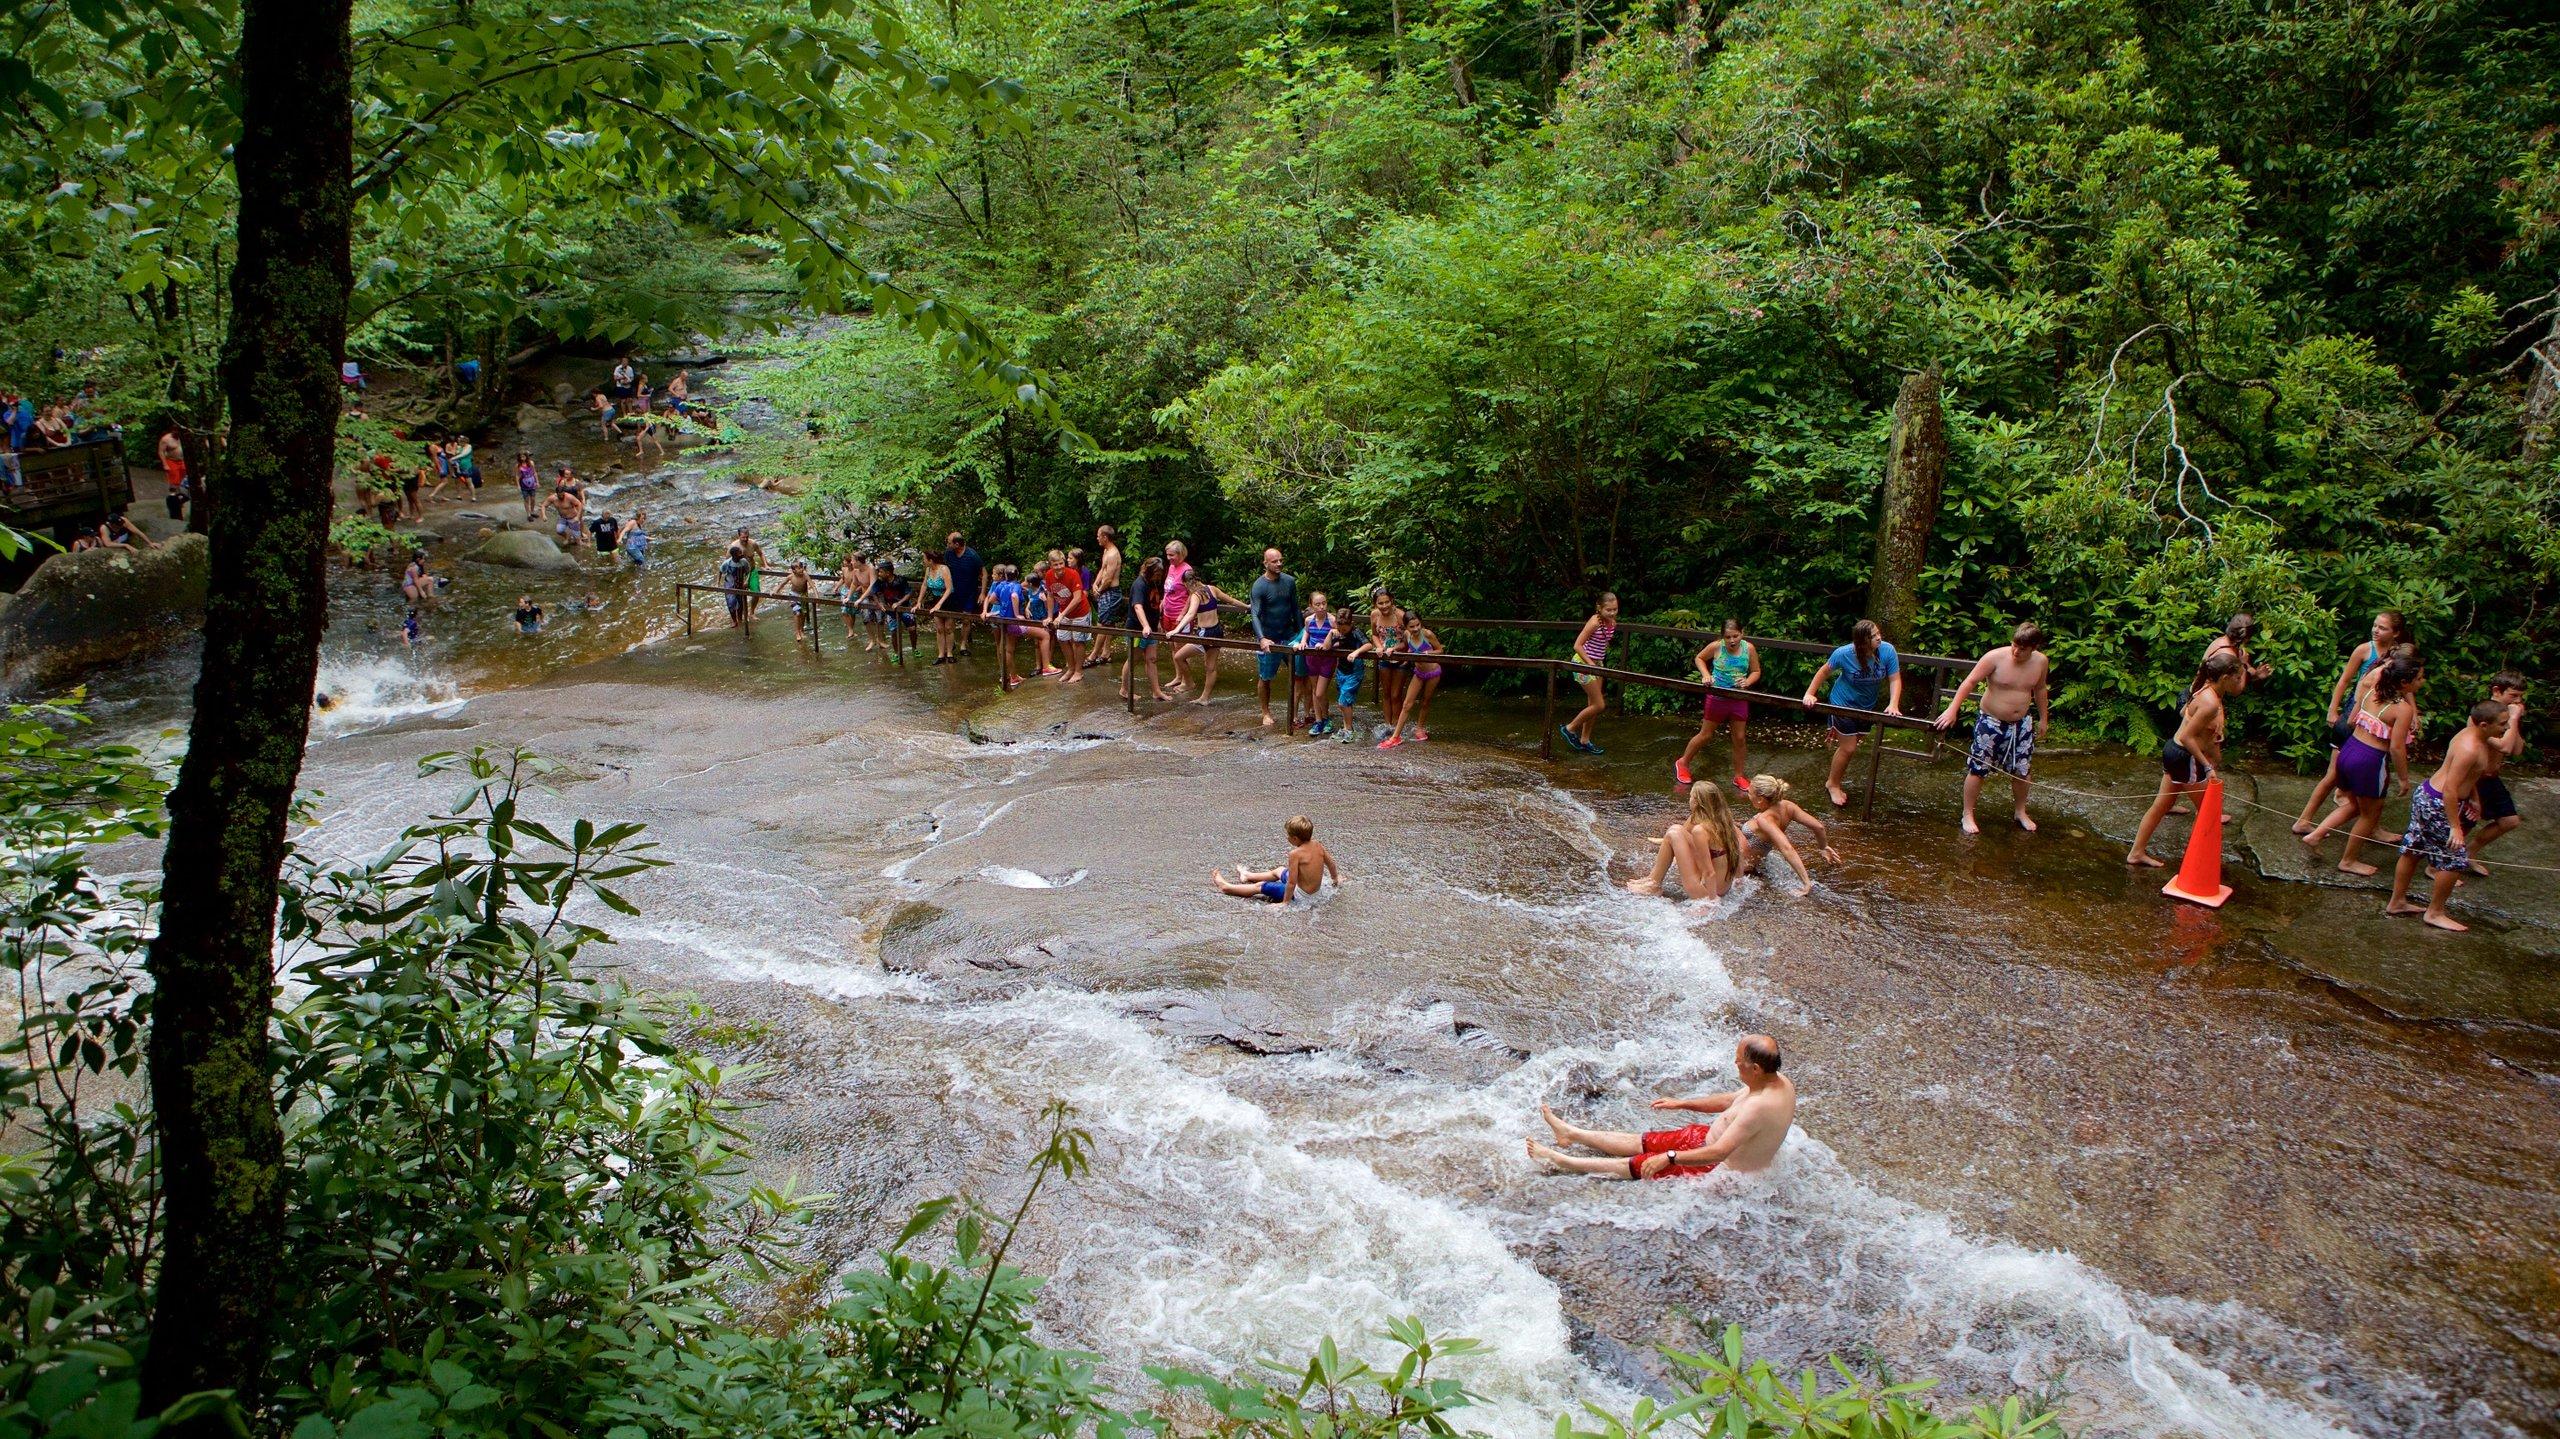 Reems Creek, North Carolina, United States of America